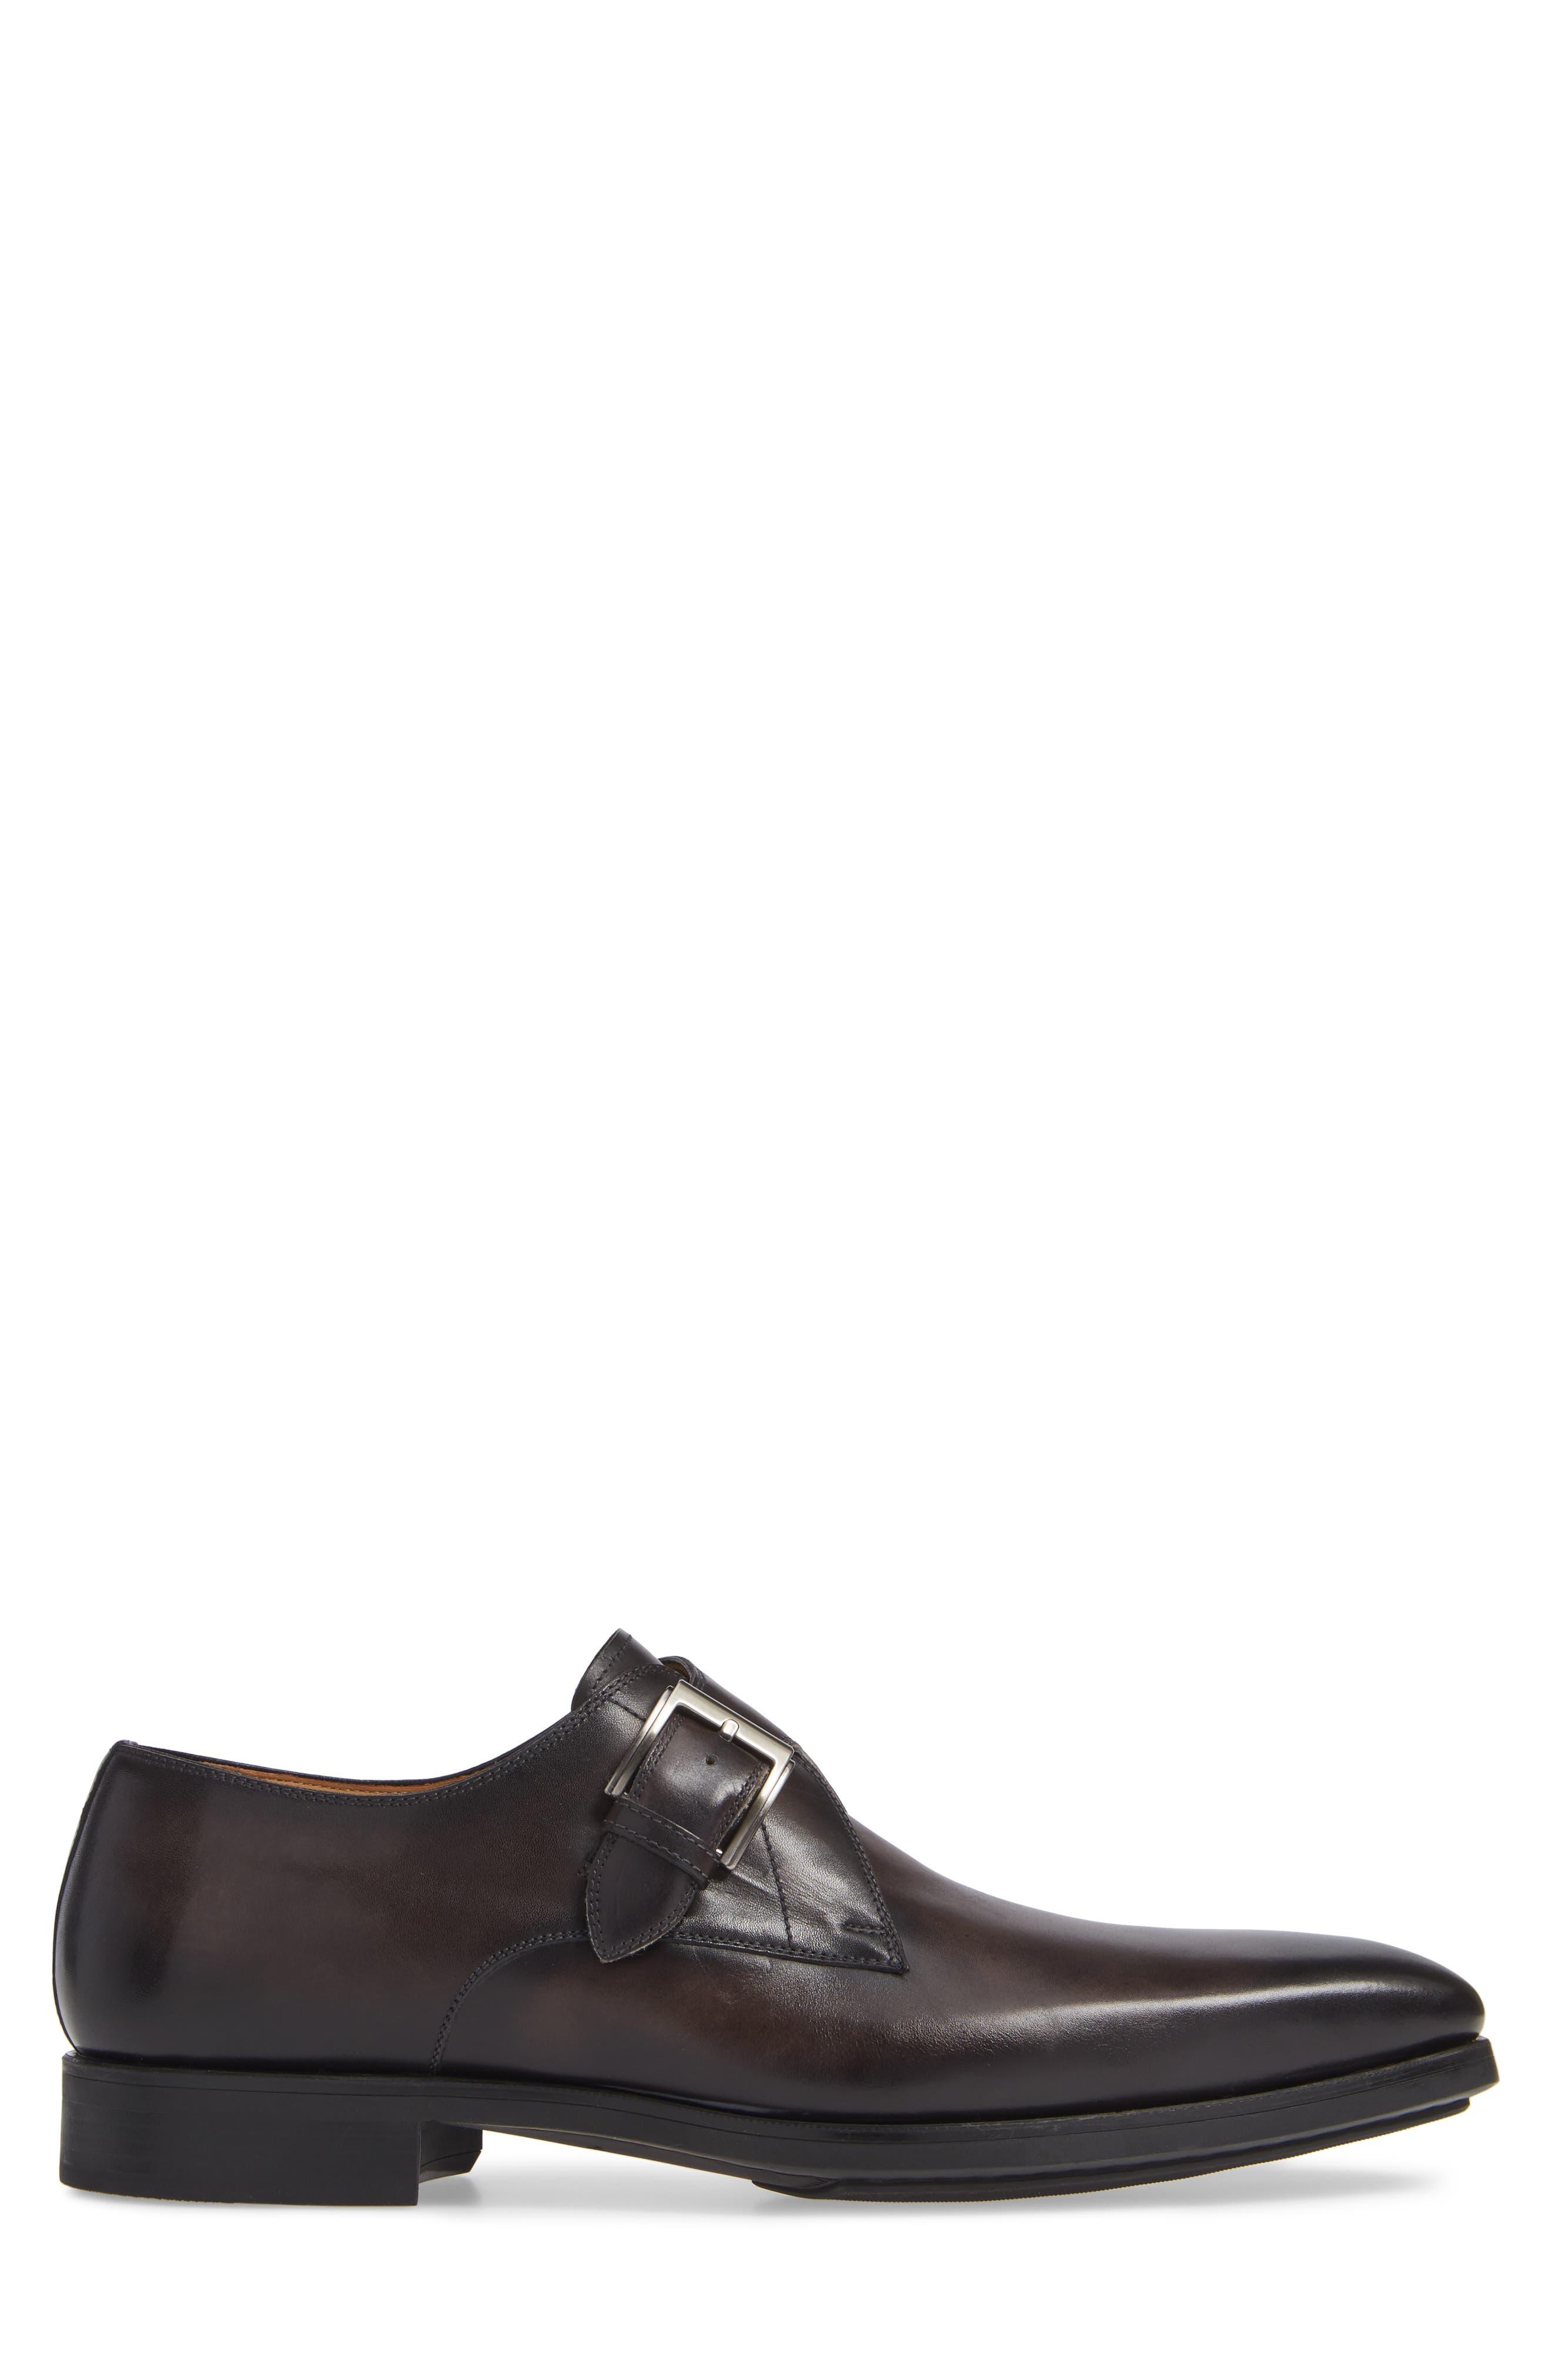 MAGNANNI, Roddy Diversa Plain Toe Monk Strap Shoe, Alternate thumbnail 3, color, GREY LEATHER